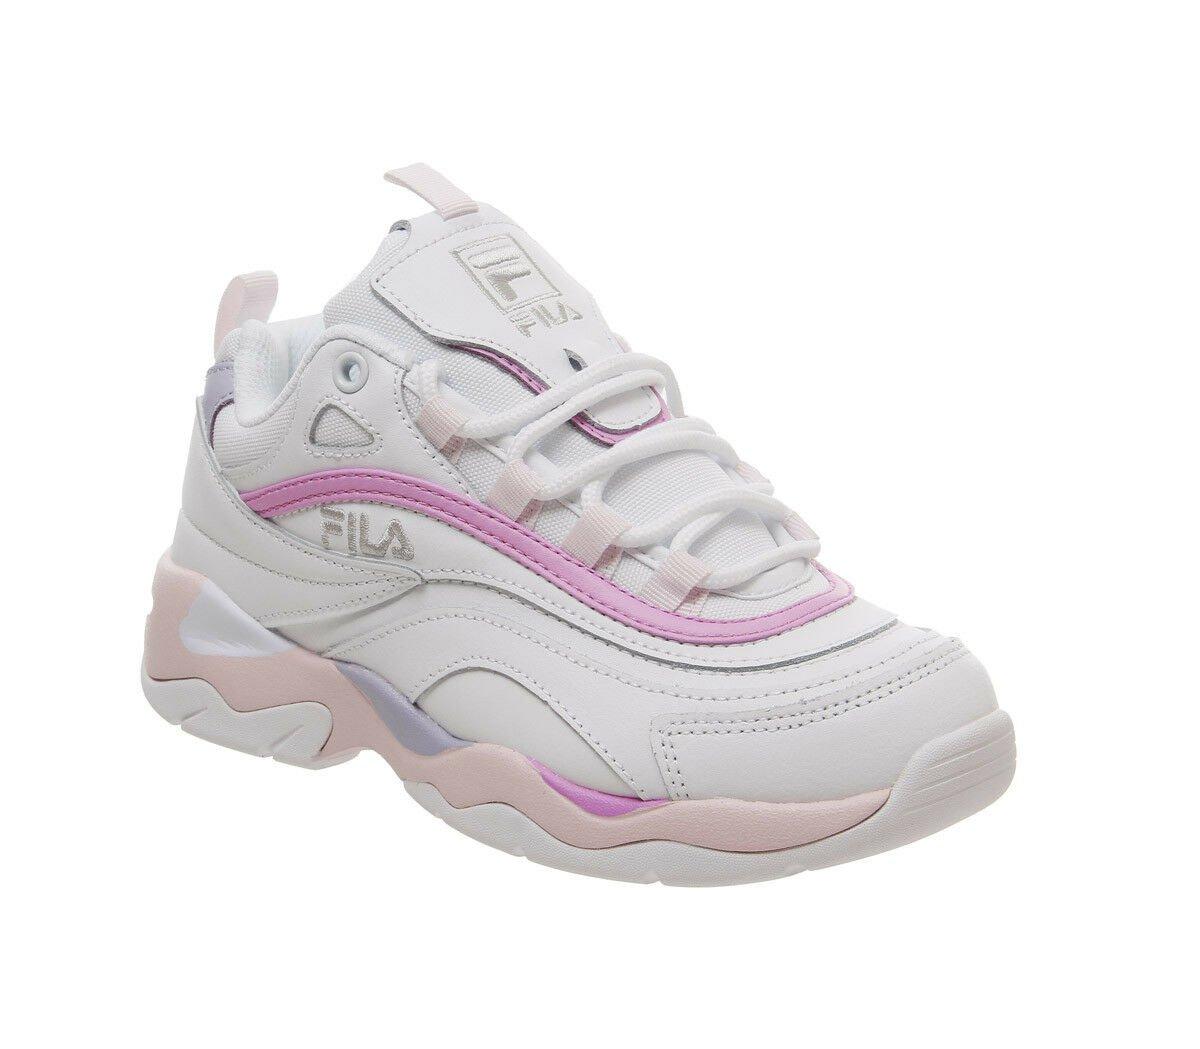 Womens Fila Fila Ray Trainers White Heavenly Pink Purple Trainers Shoes | eBay